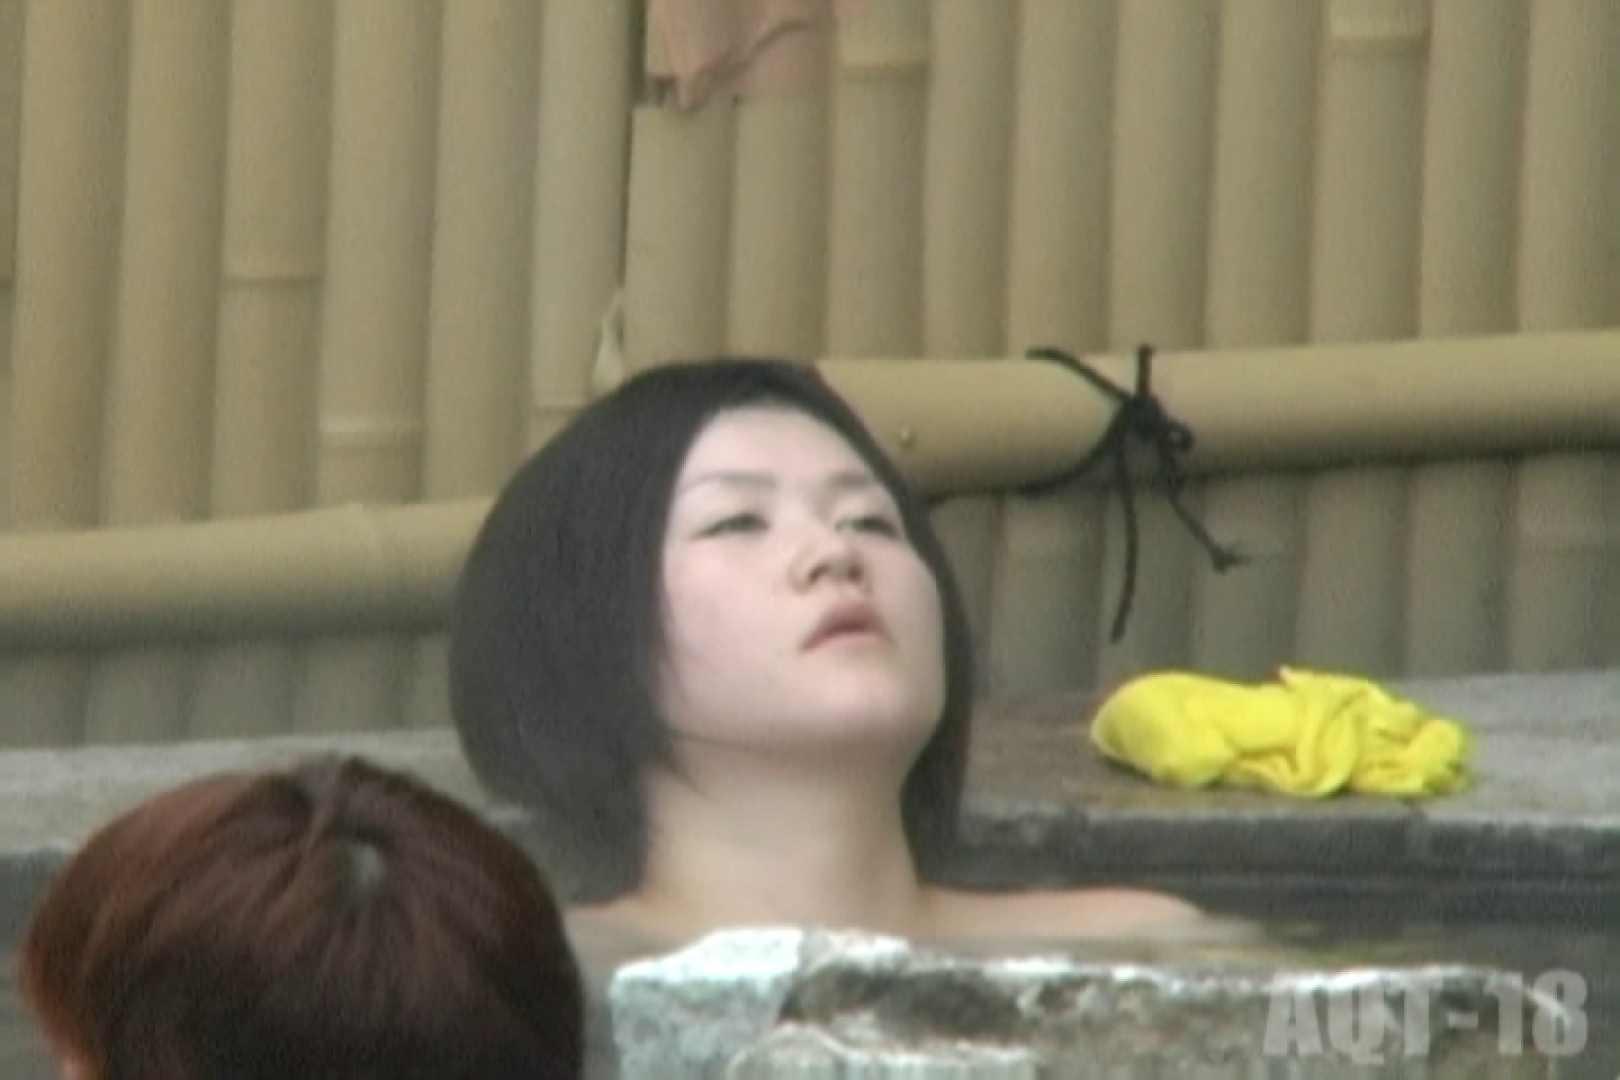 女露天風呂劇場 Vol.24 丸見え 戯れ無修正画像 107画像 101